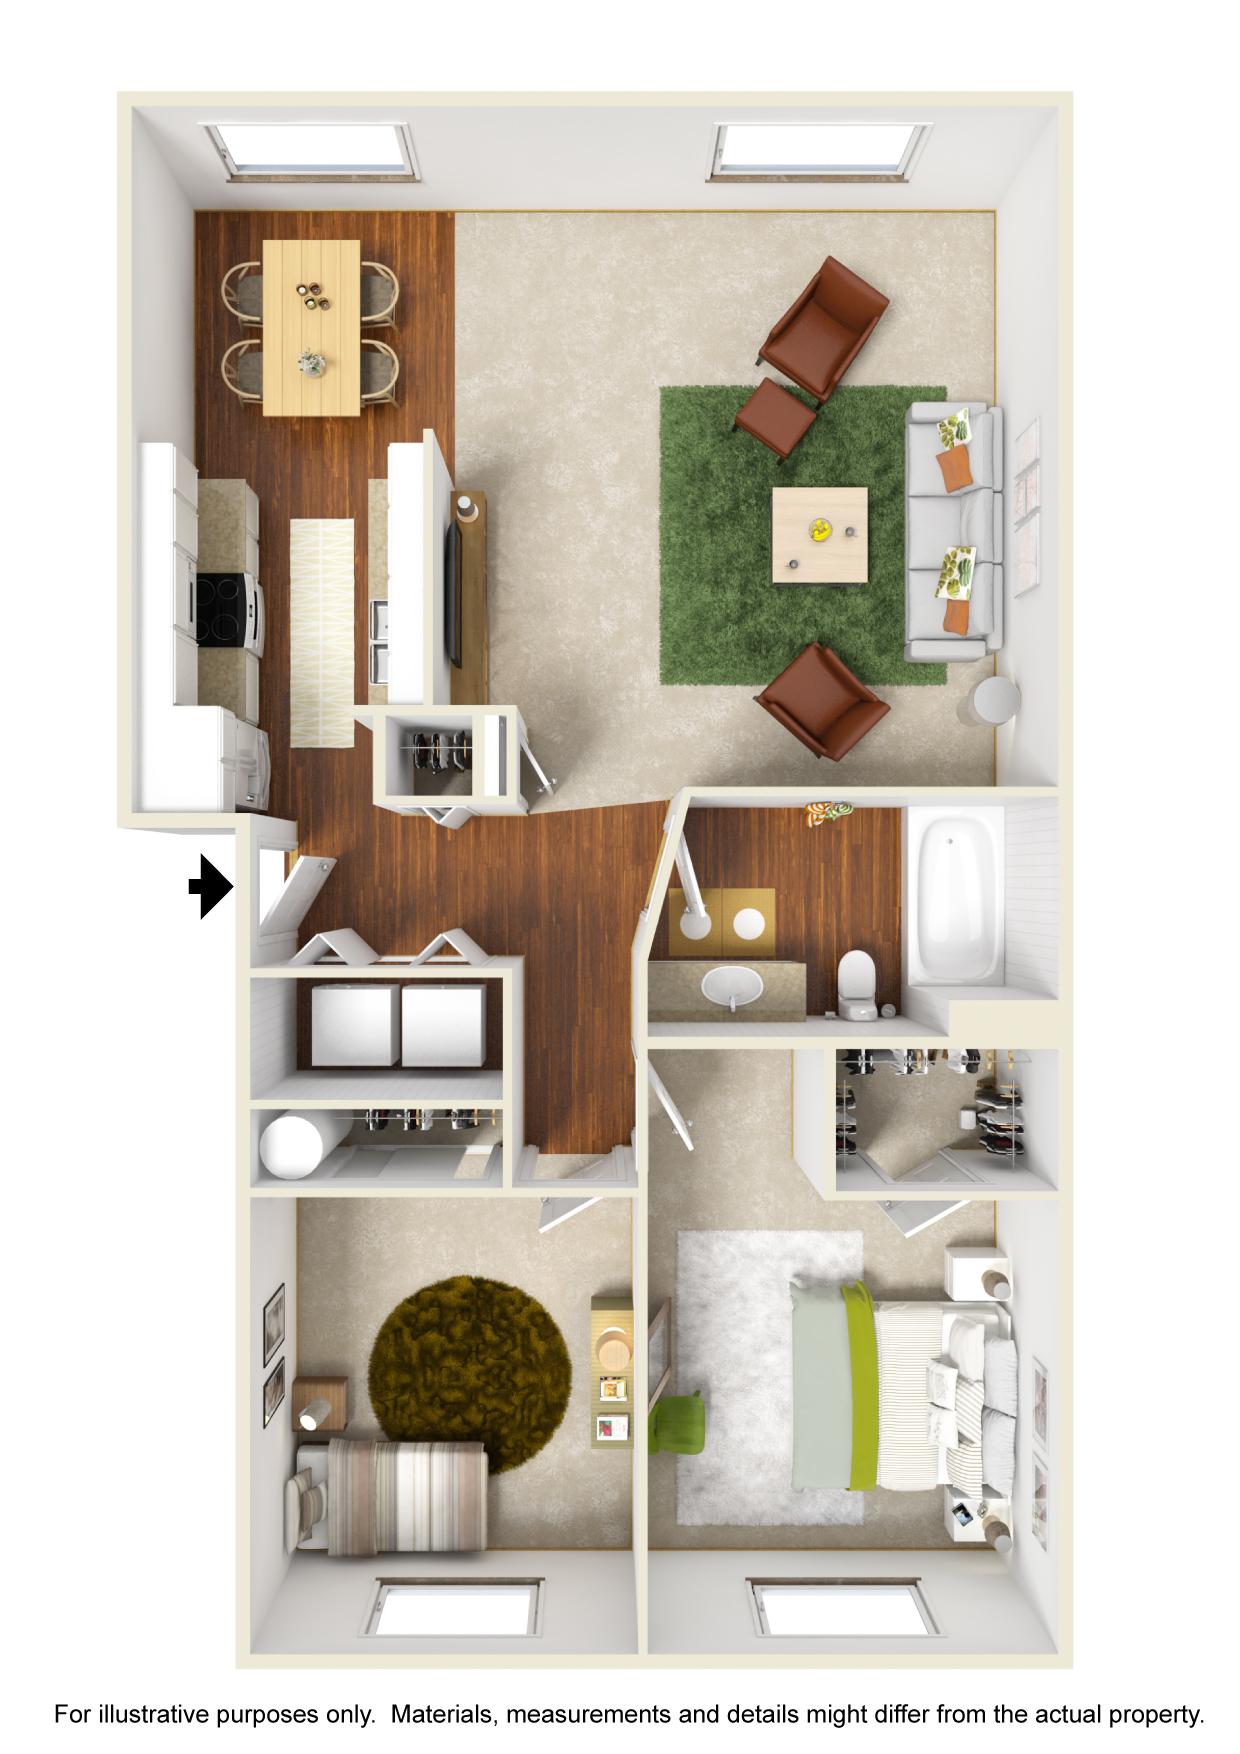 Corvallis Apartments | Spring Creek | Floorplan 2